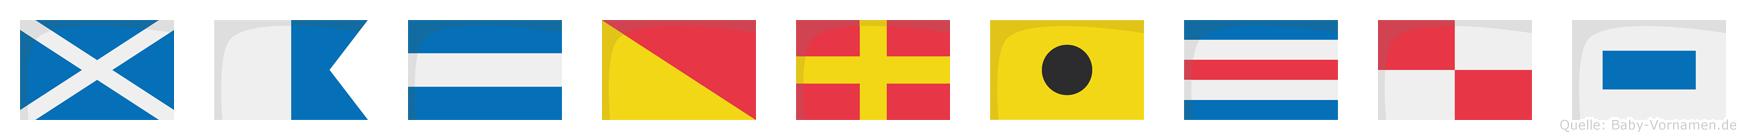 Majoricus im Flaggenalphabet